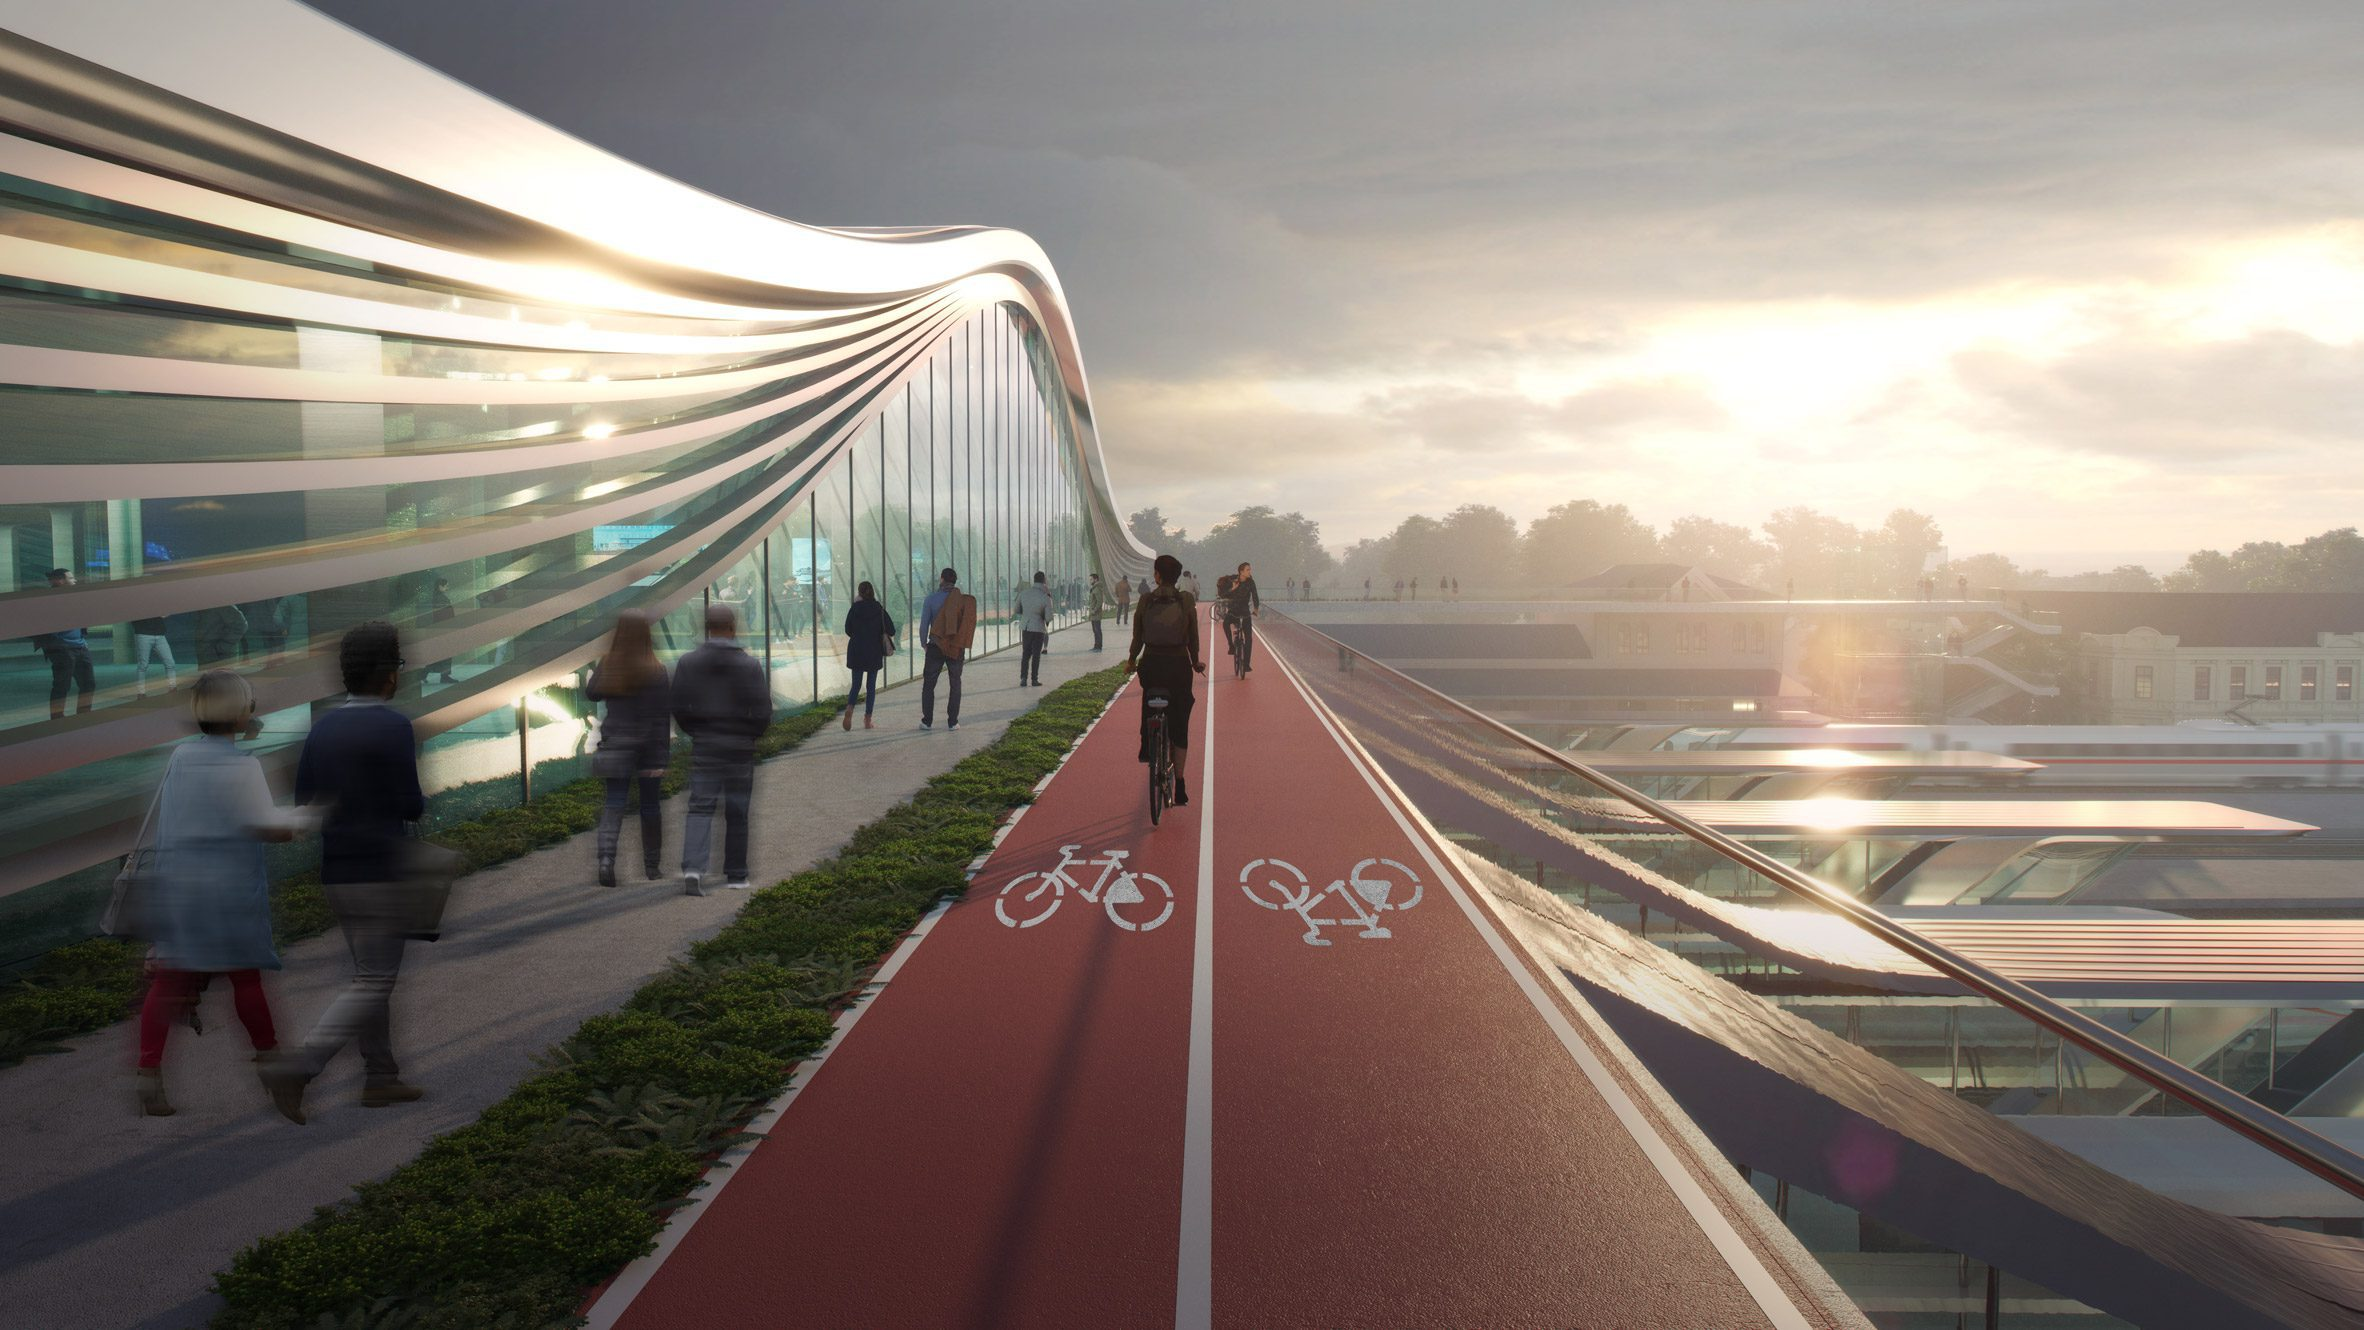 Мост с велосипедными дорожками от Zaha Hadid Architects